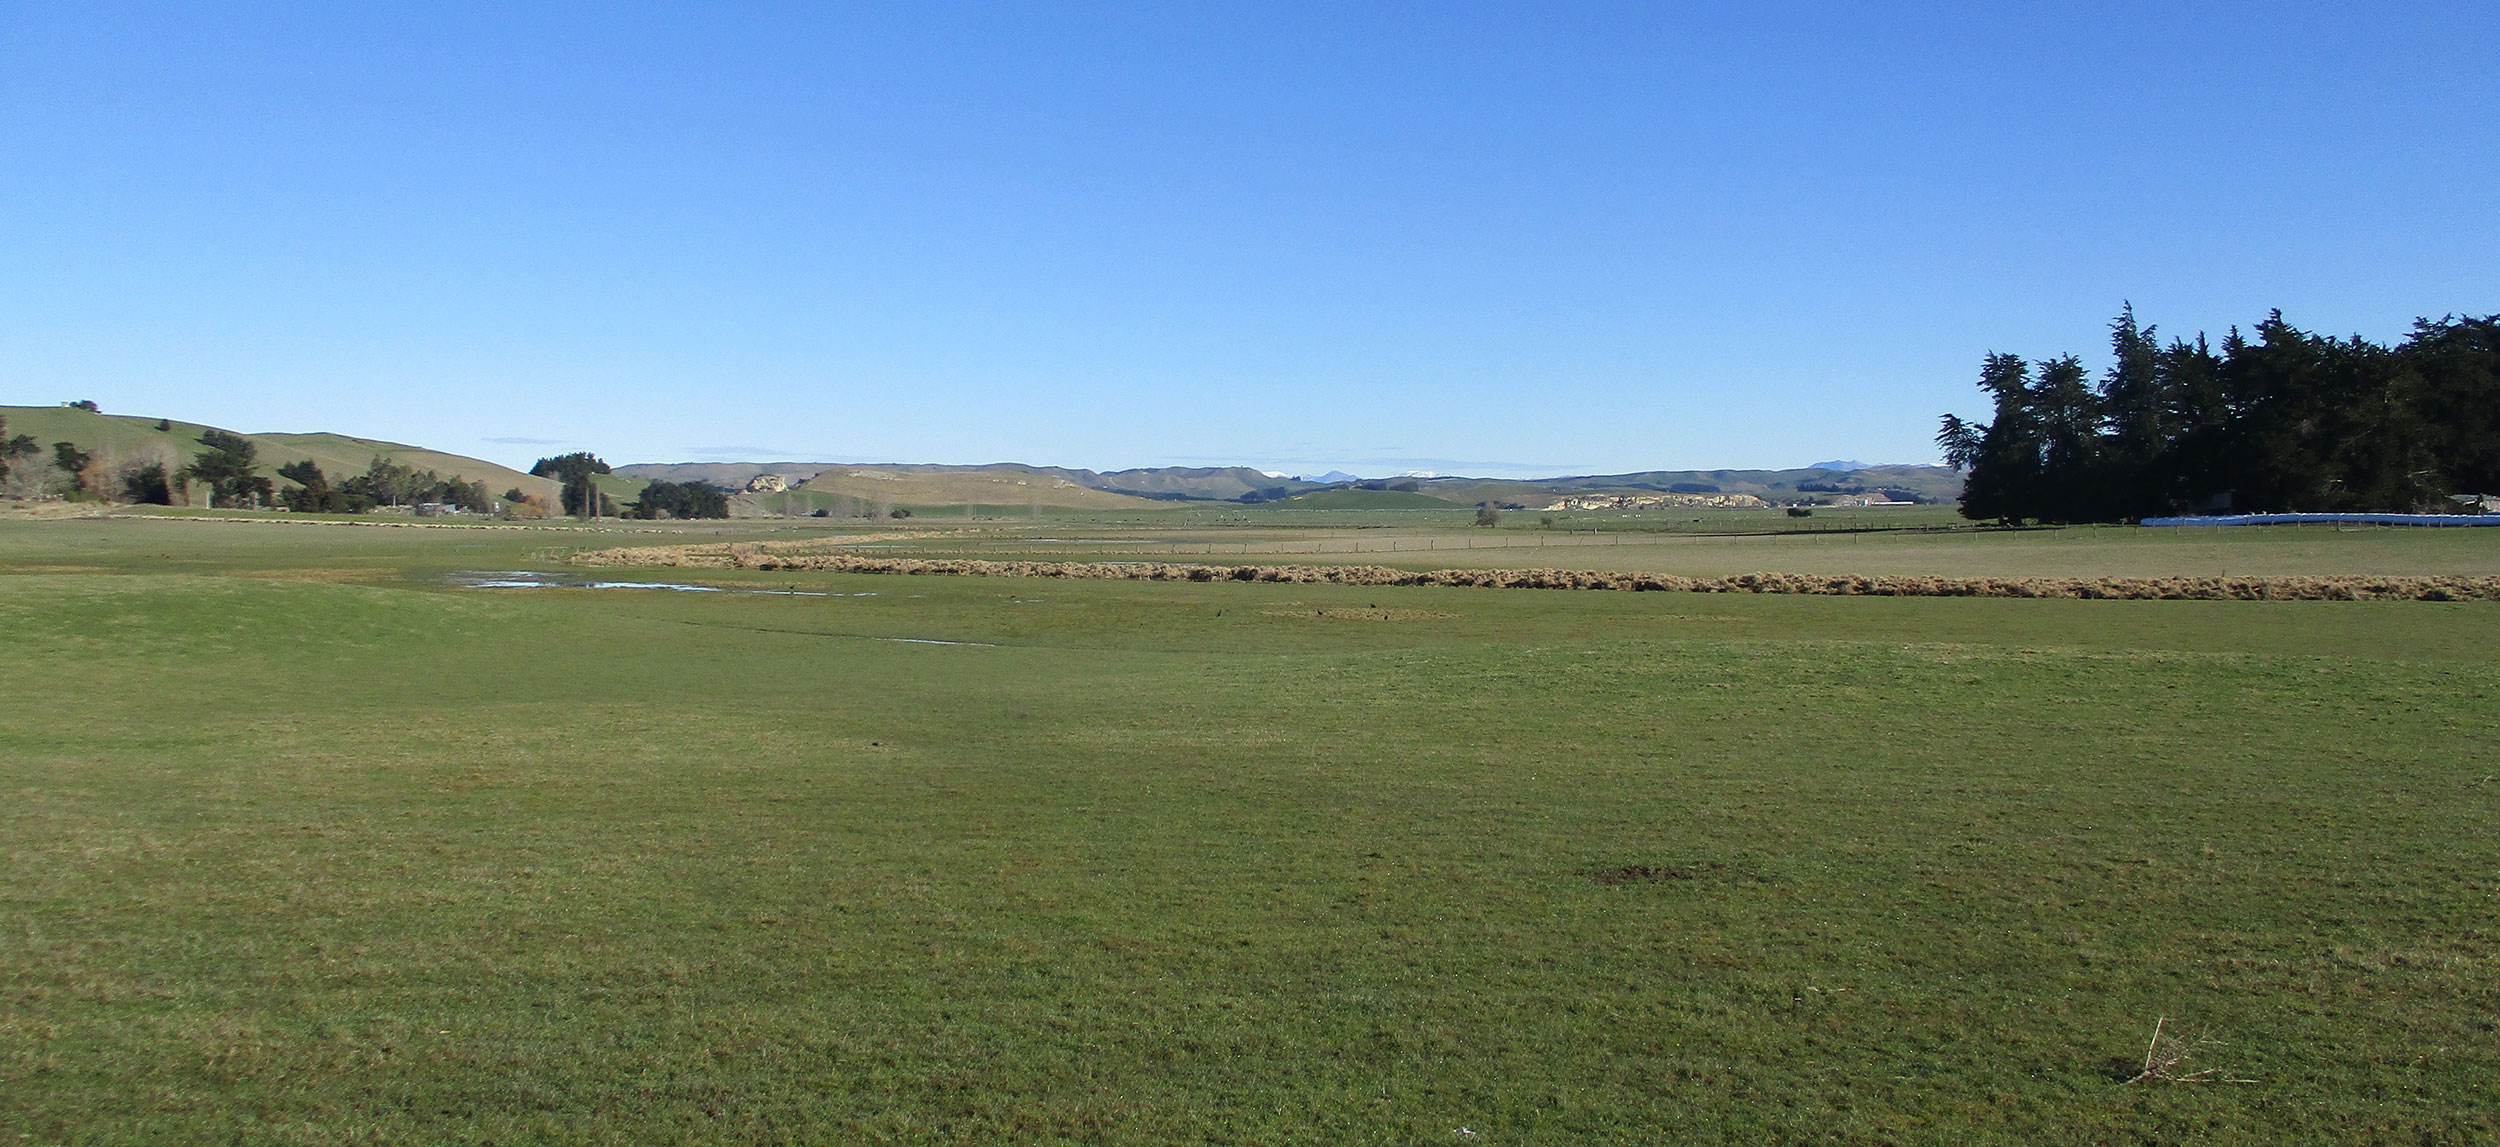 Farmland at Kapua, looking out towards Waihao Downs.